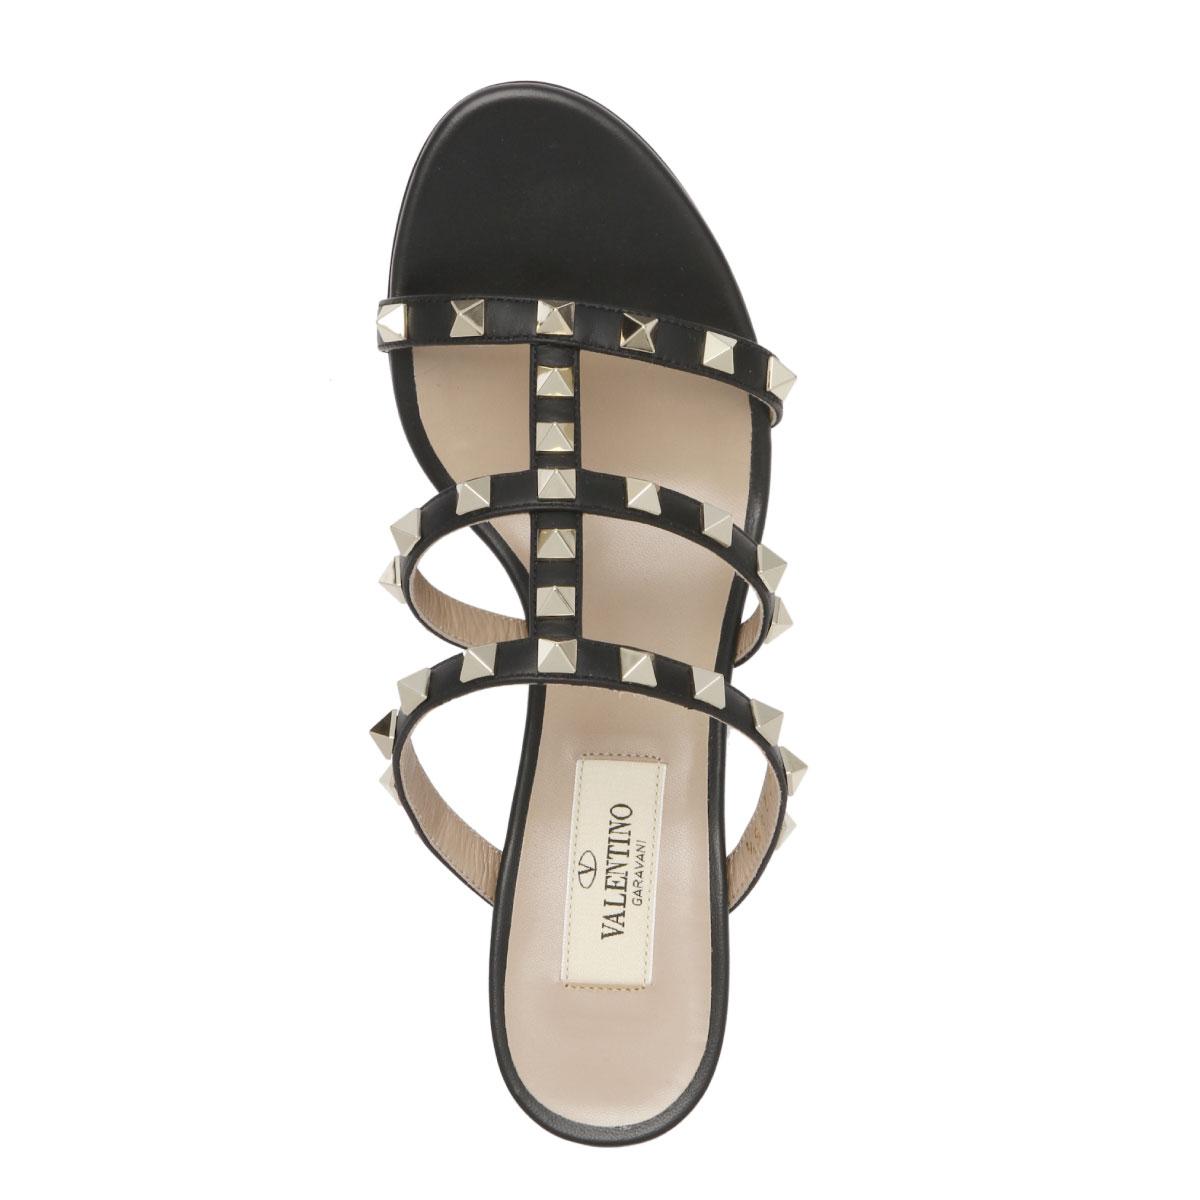 3f7a32d8ade ... Valentino VALENTINO shoes Lady's RW2S0C47 VOD 0NO sandals ROCKSTUD lock  stud bolt NERO/NER black ...